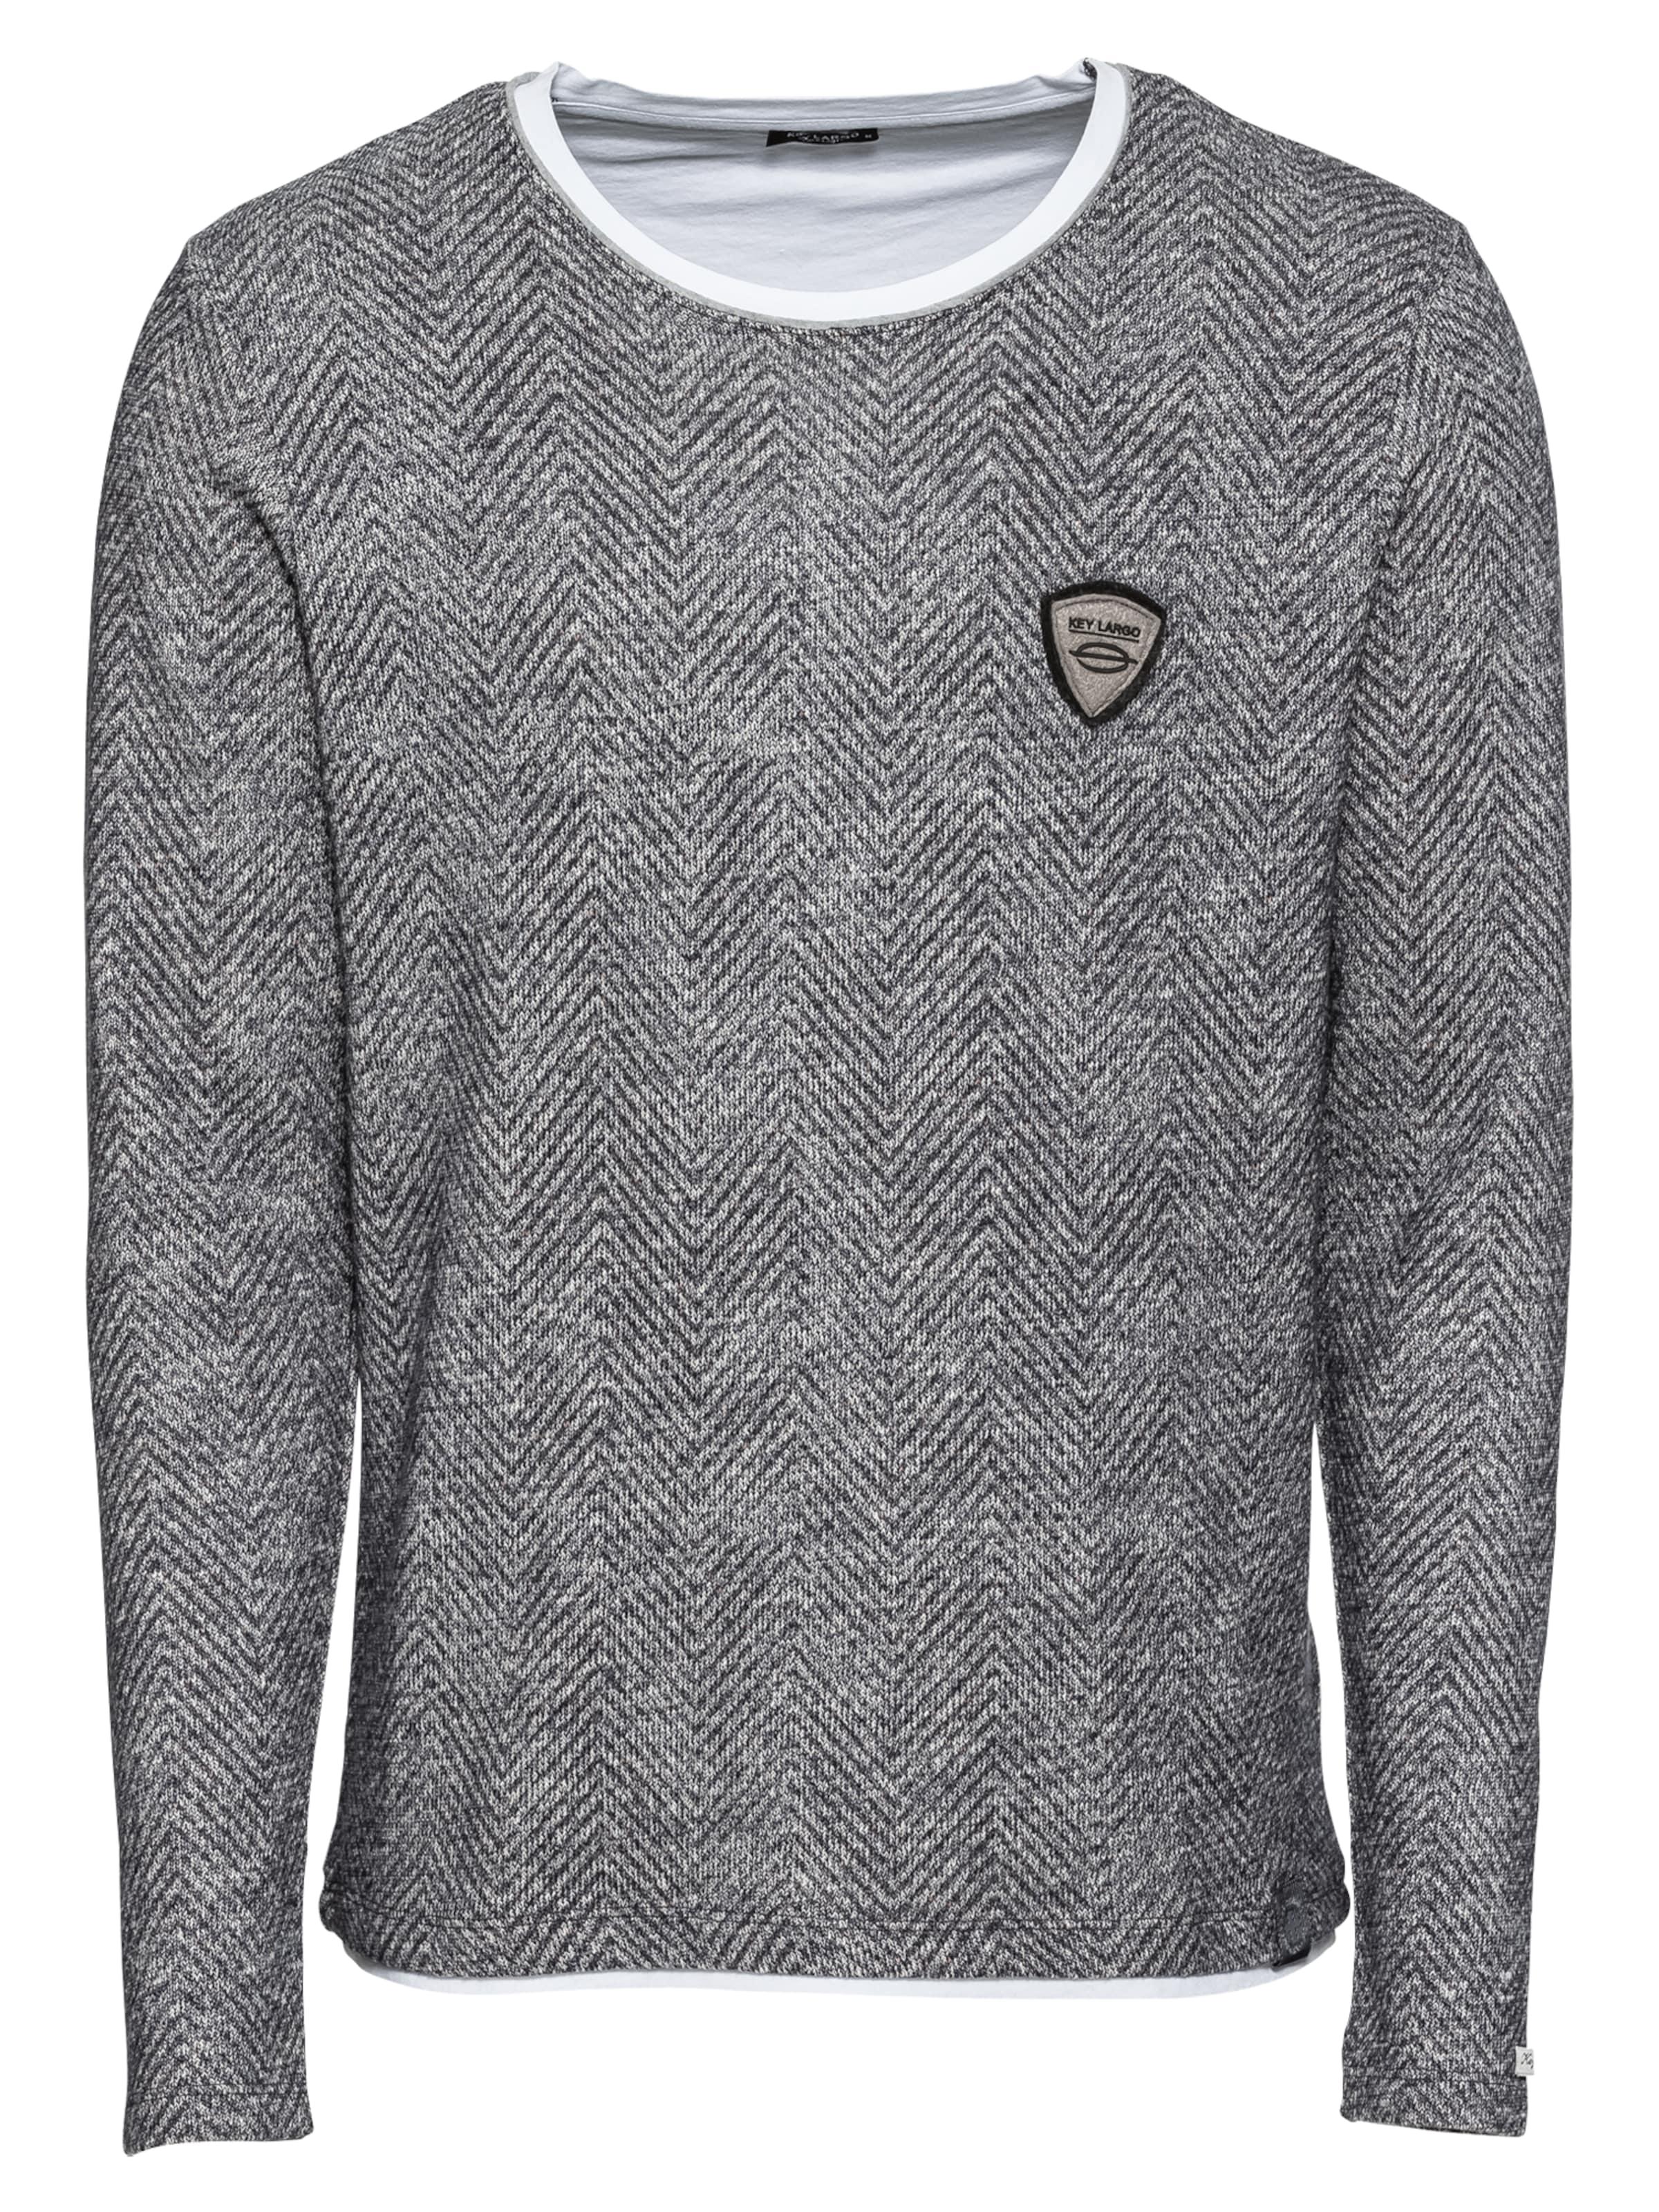 Round' Gris Largo 'msw Key Sweat Agility shirt En SzVUMp